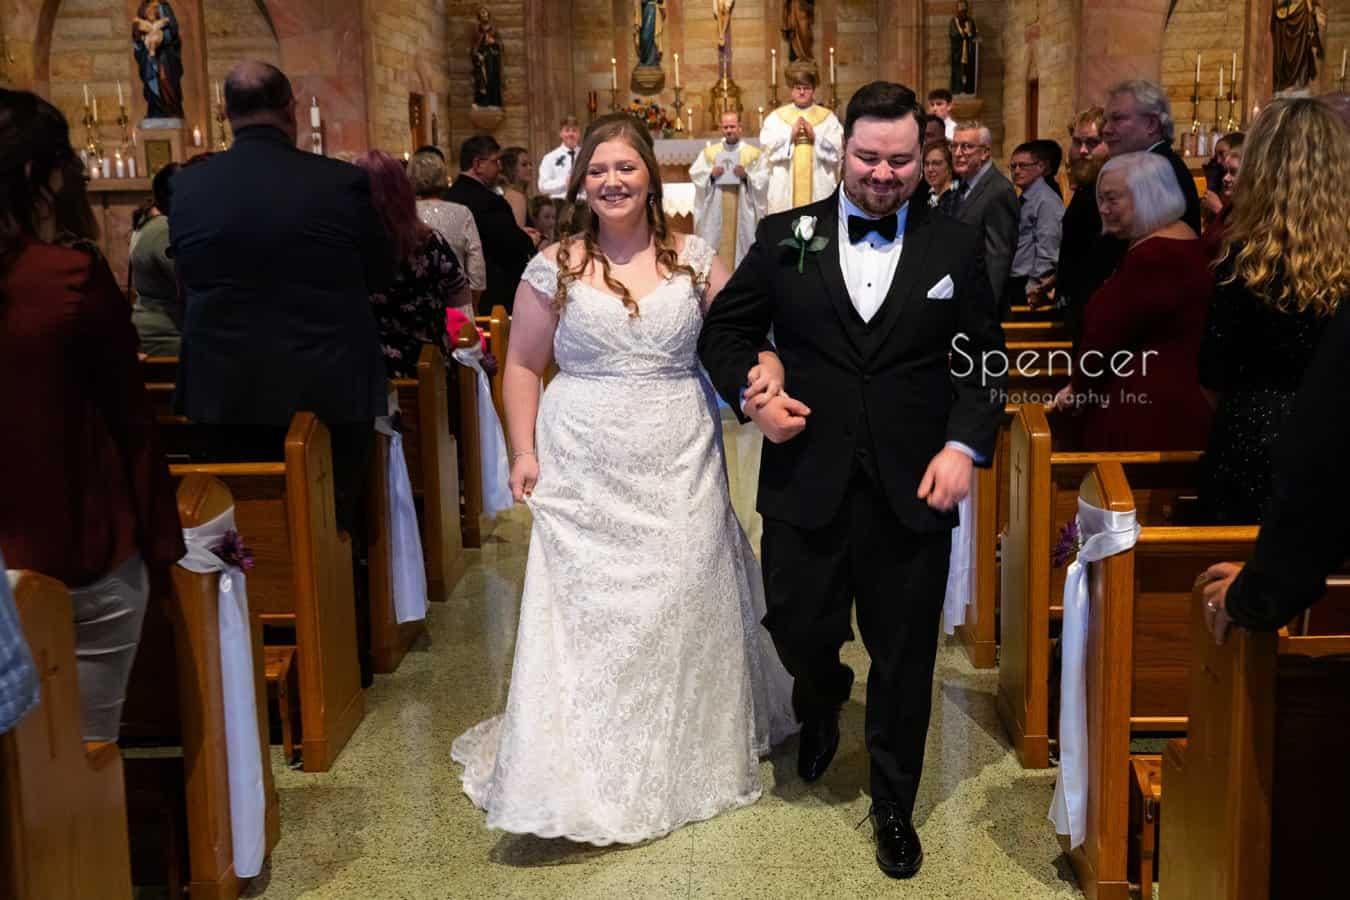 wedding processional at Indiana wedding ceremony